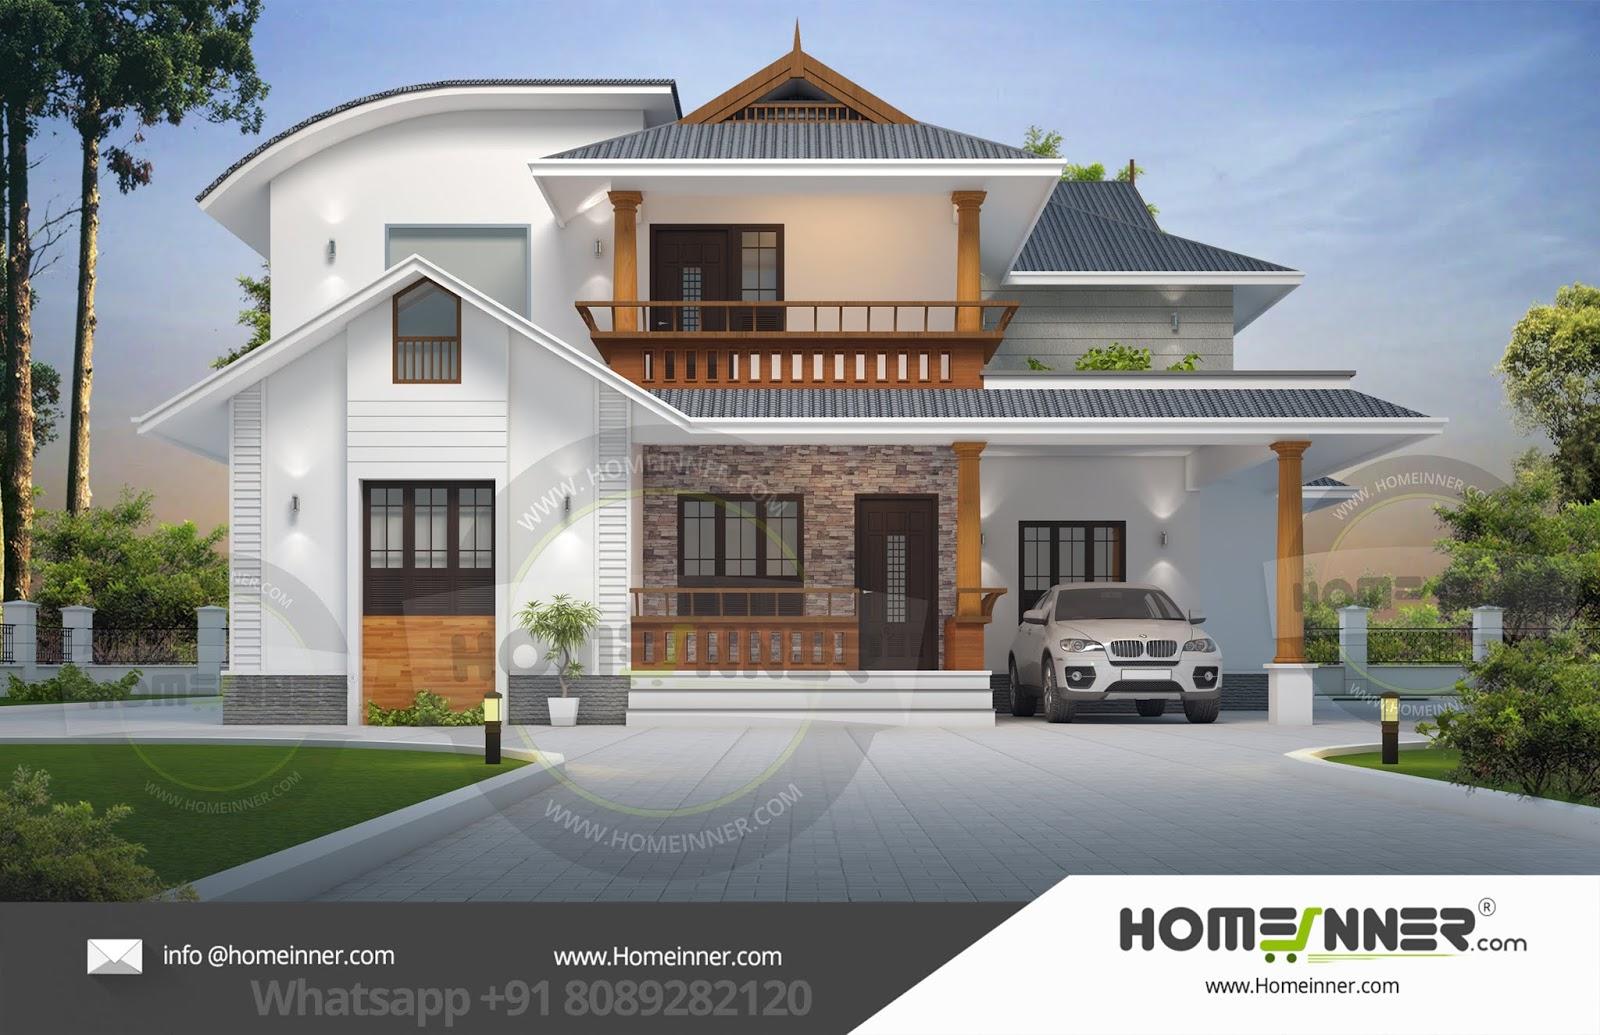 33 Lakh 3 BHK 2337 sq ft Guntur Villa